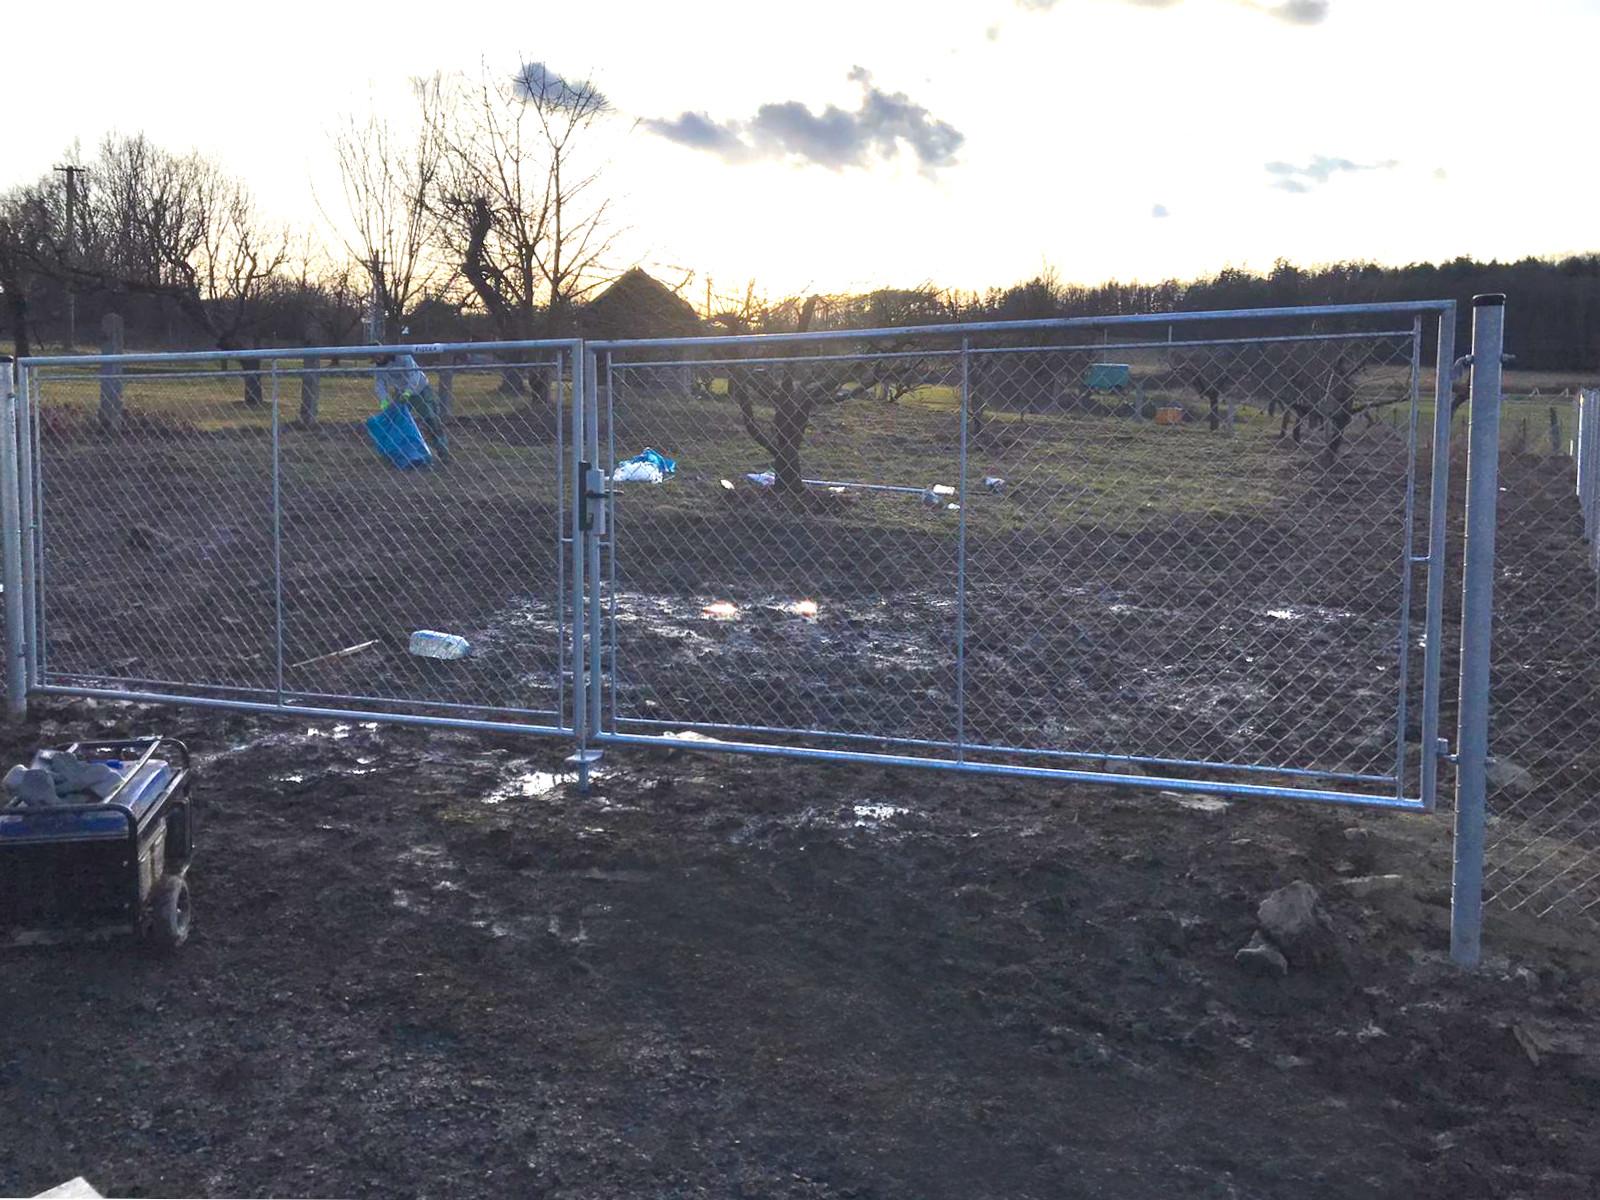 Brána zahradní dvoukřídlá pletivo, výška 160x360cm OKO pozink